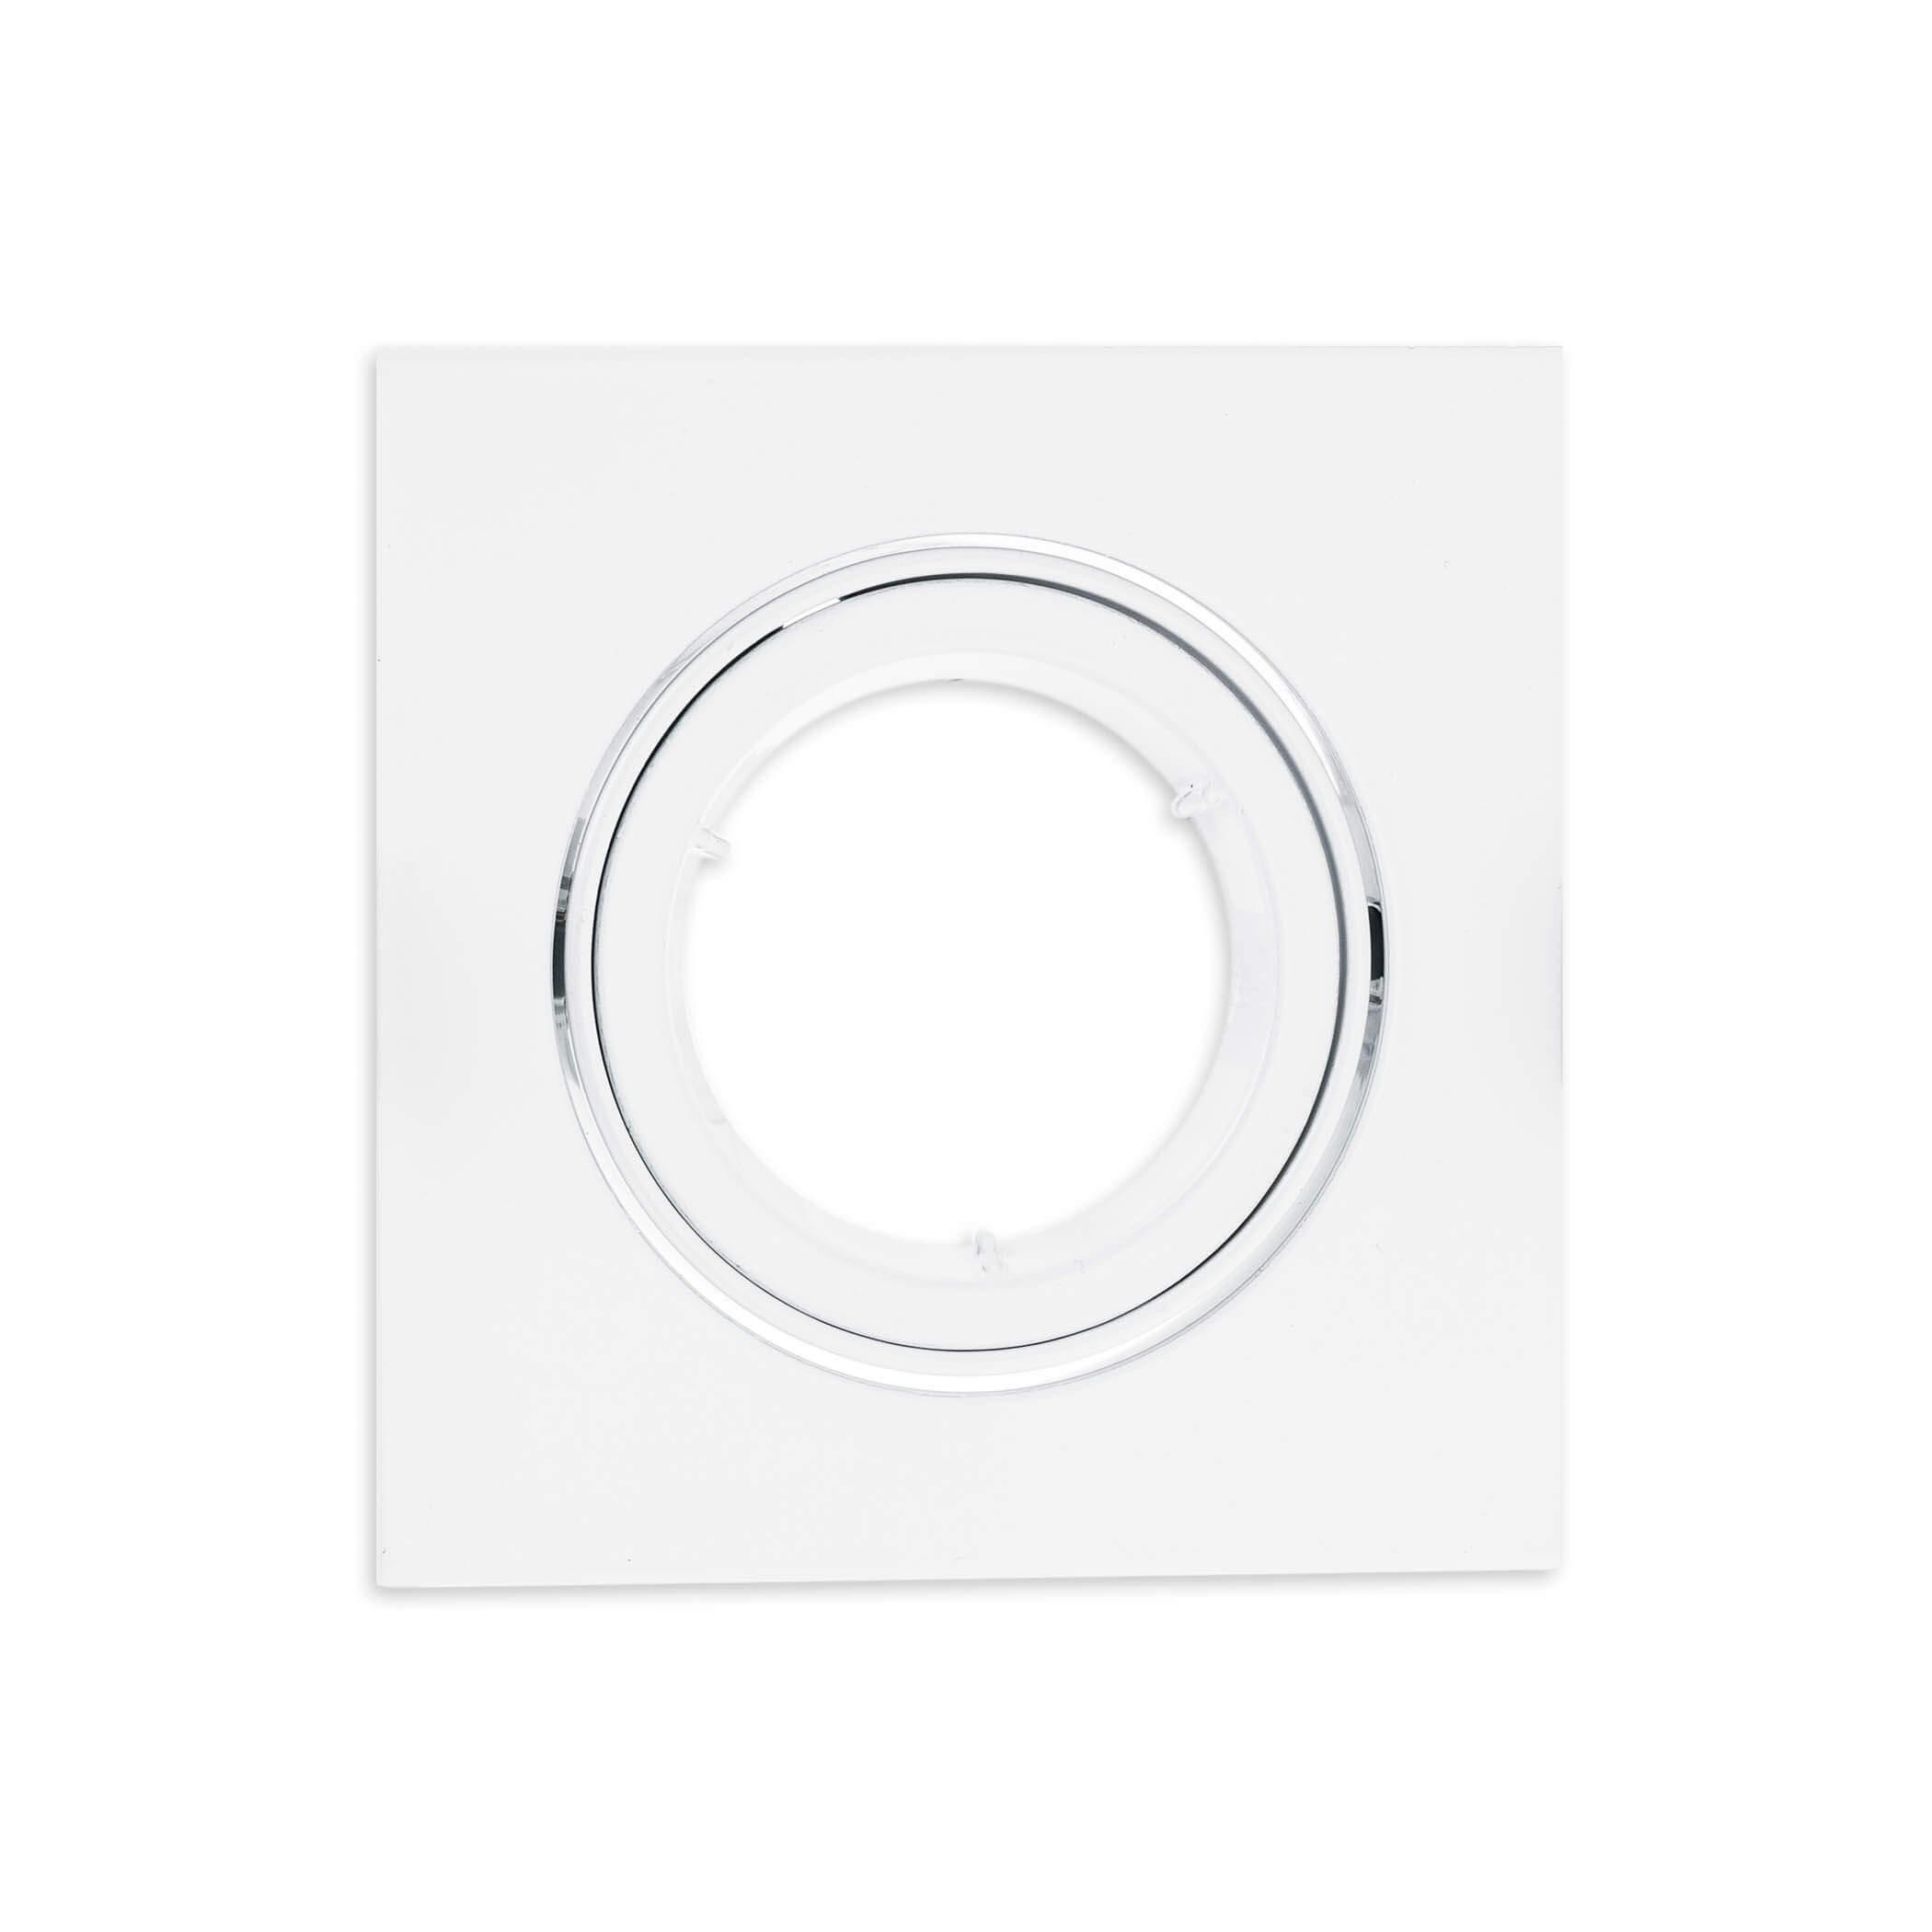 Türklingel Paris 007 mit LED Klingel incl Gravur Klingelplatte anthrazit RAL7016